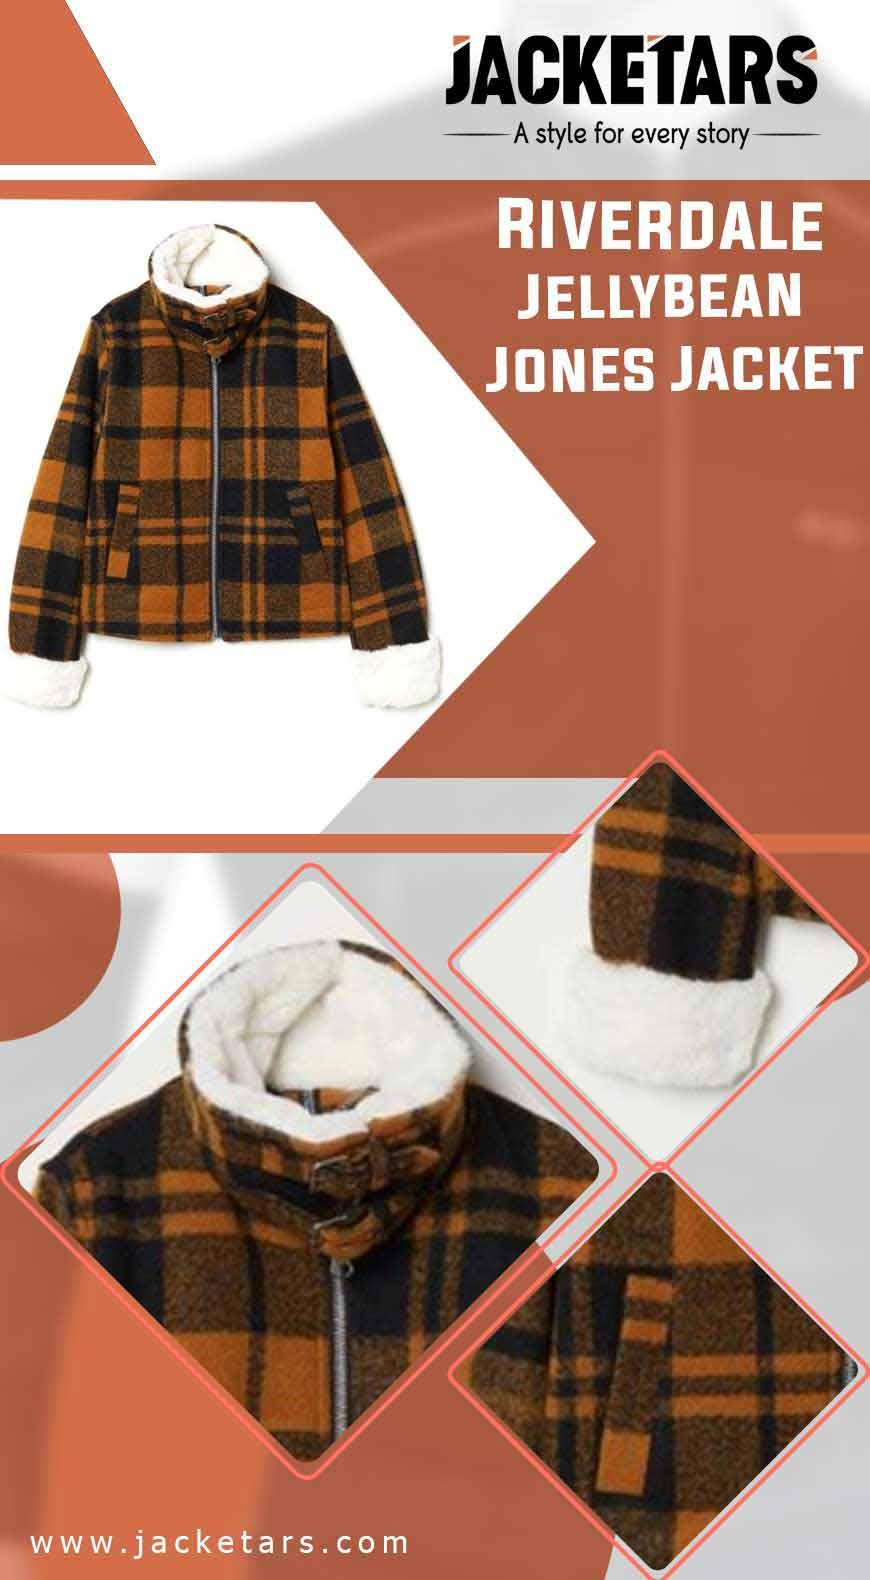 Riverdale Jellybean Jones Jacket info